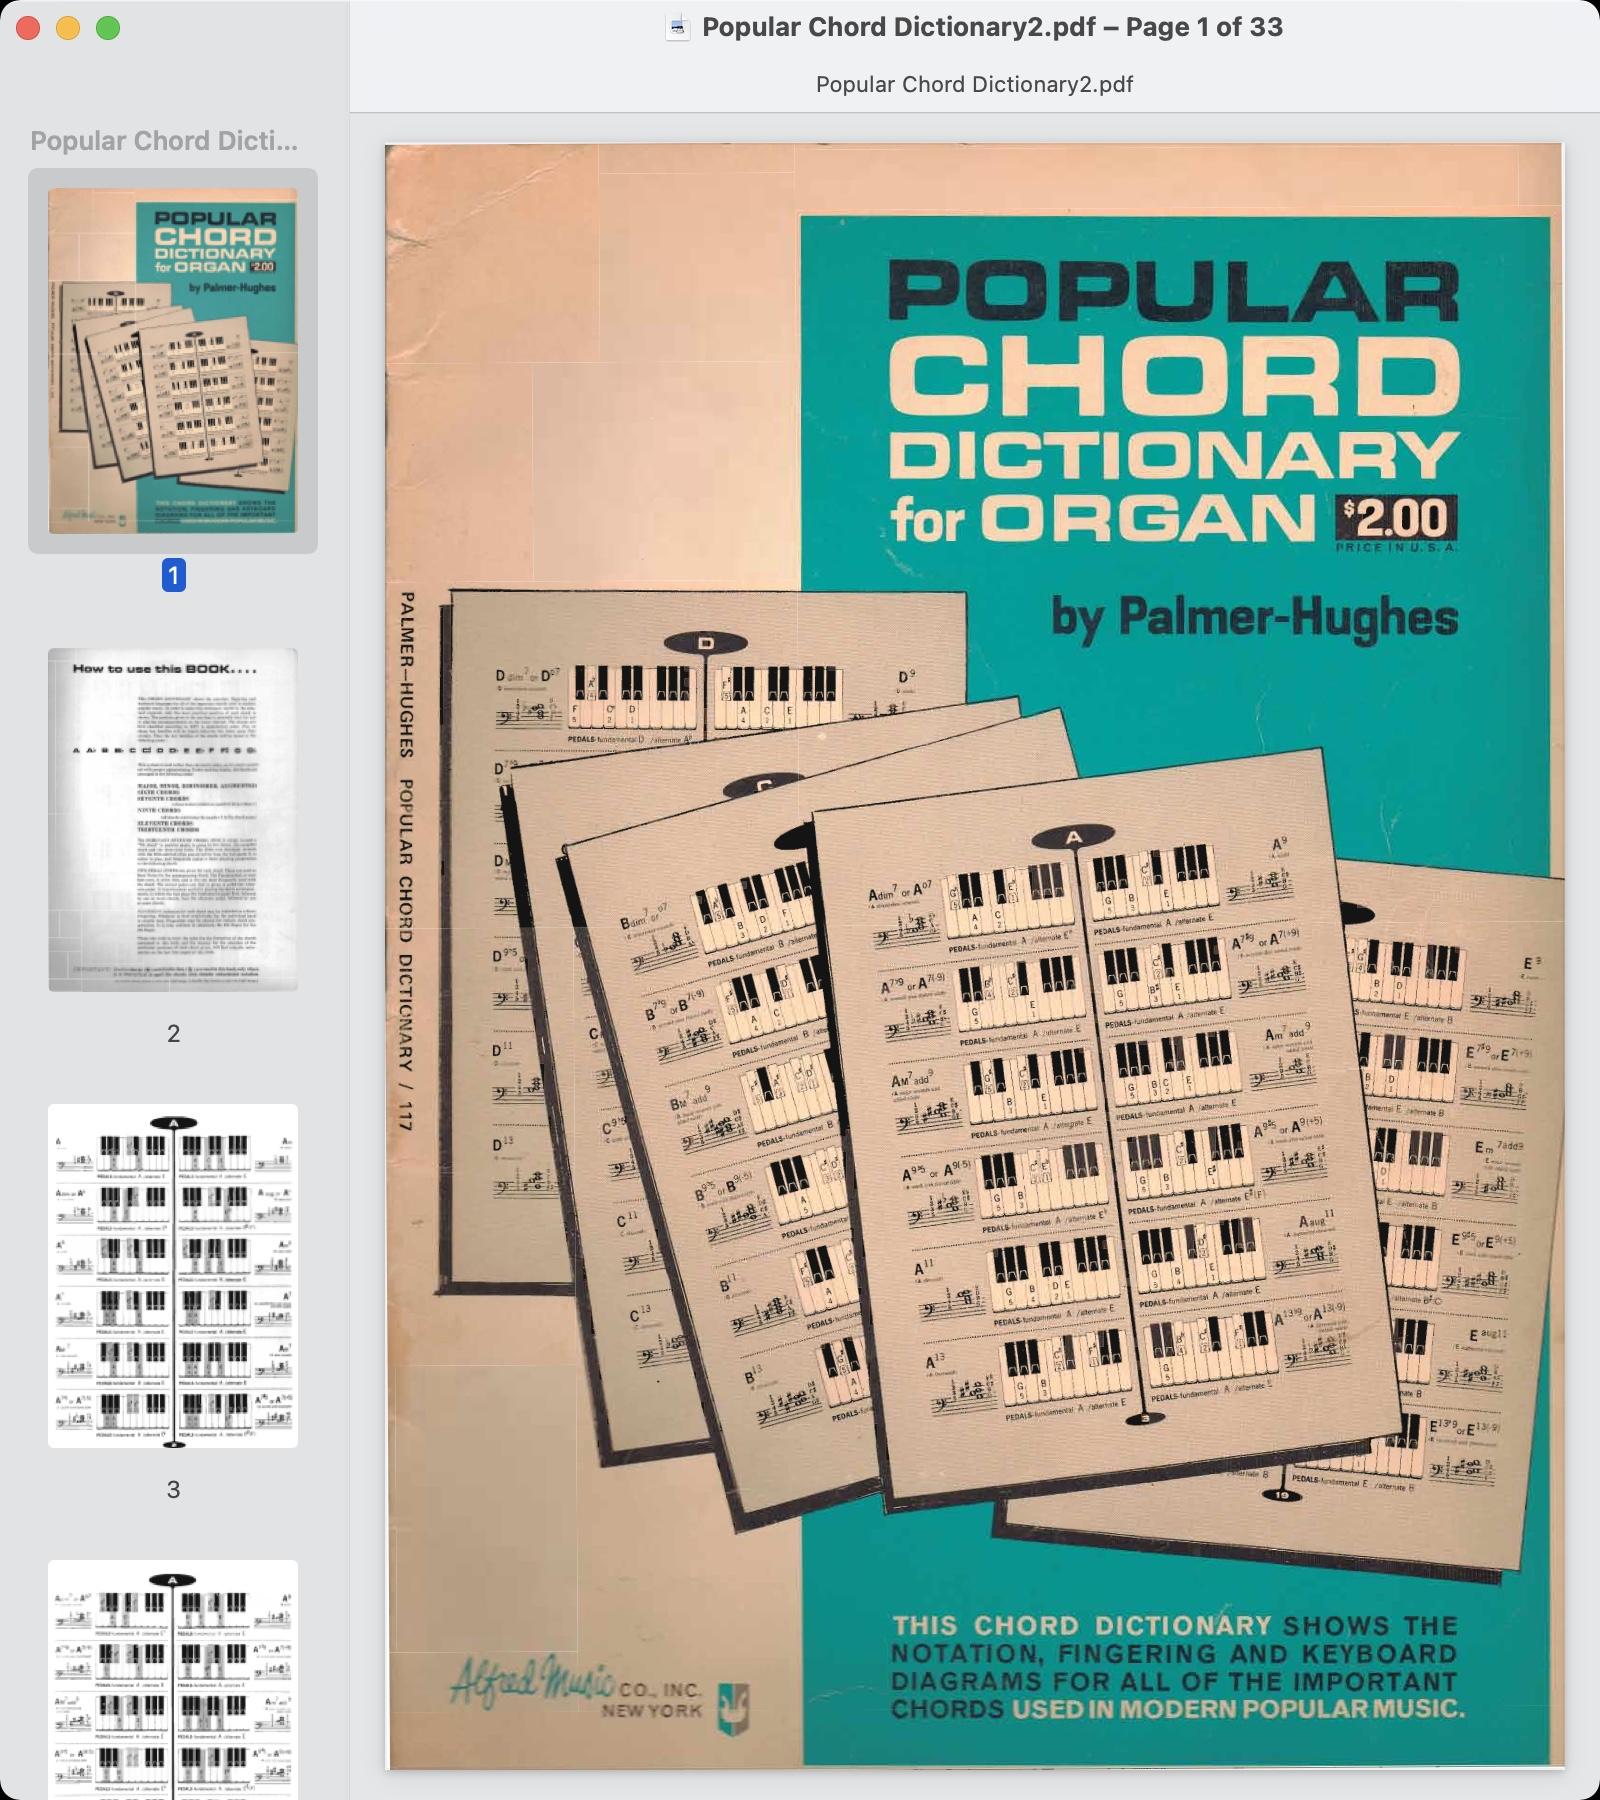 Popular Chord Dictionary2.jpg